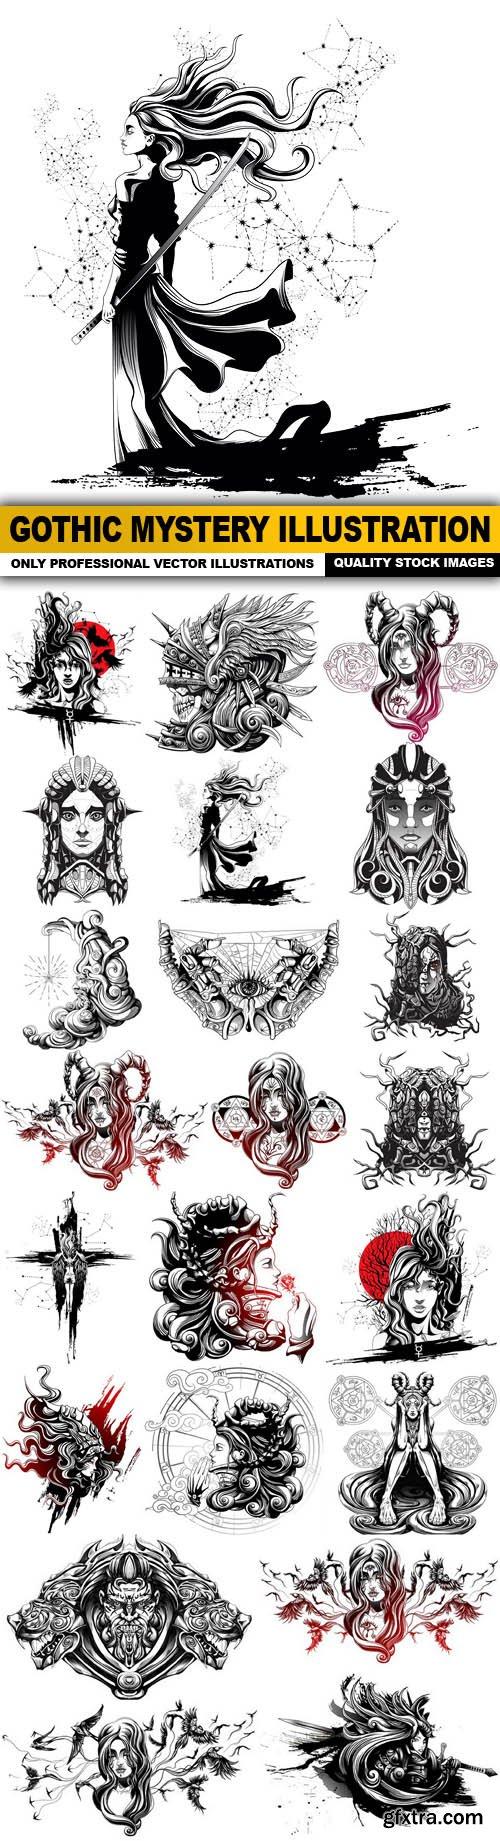 Gothic Mystery Illustration - 22 Vector